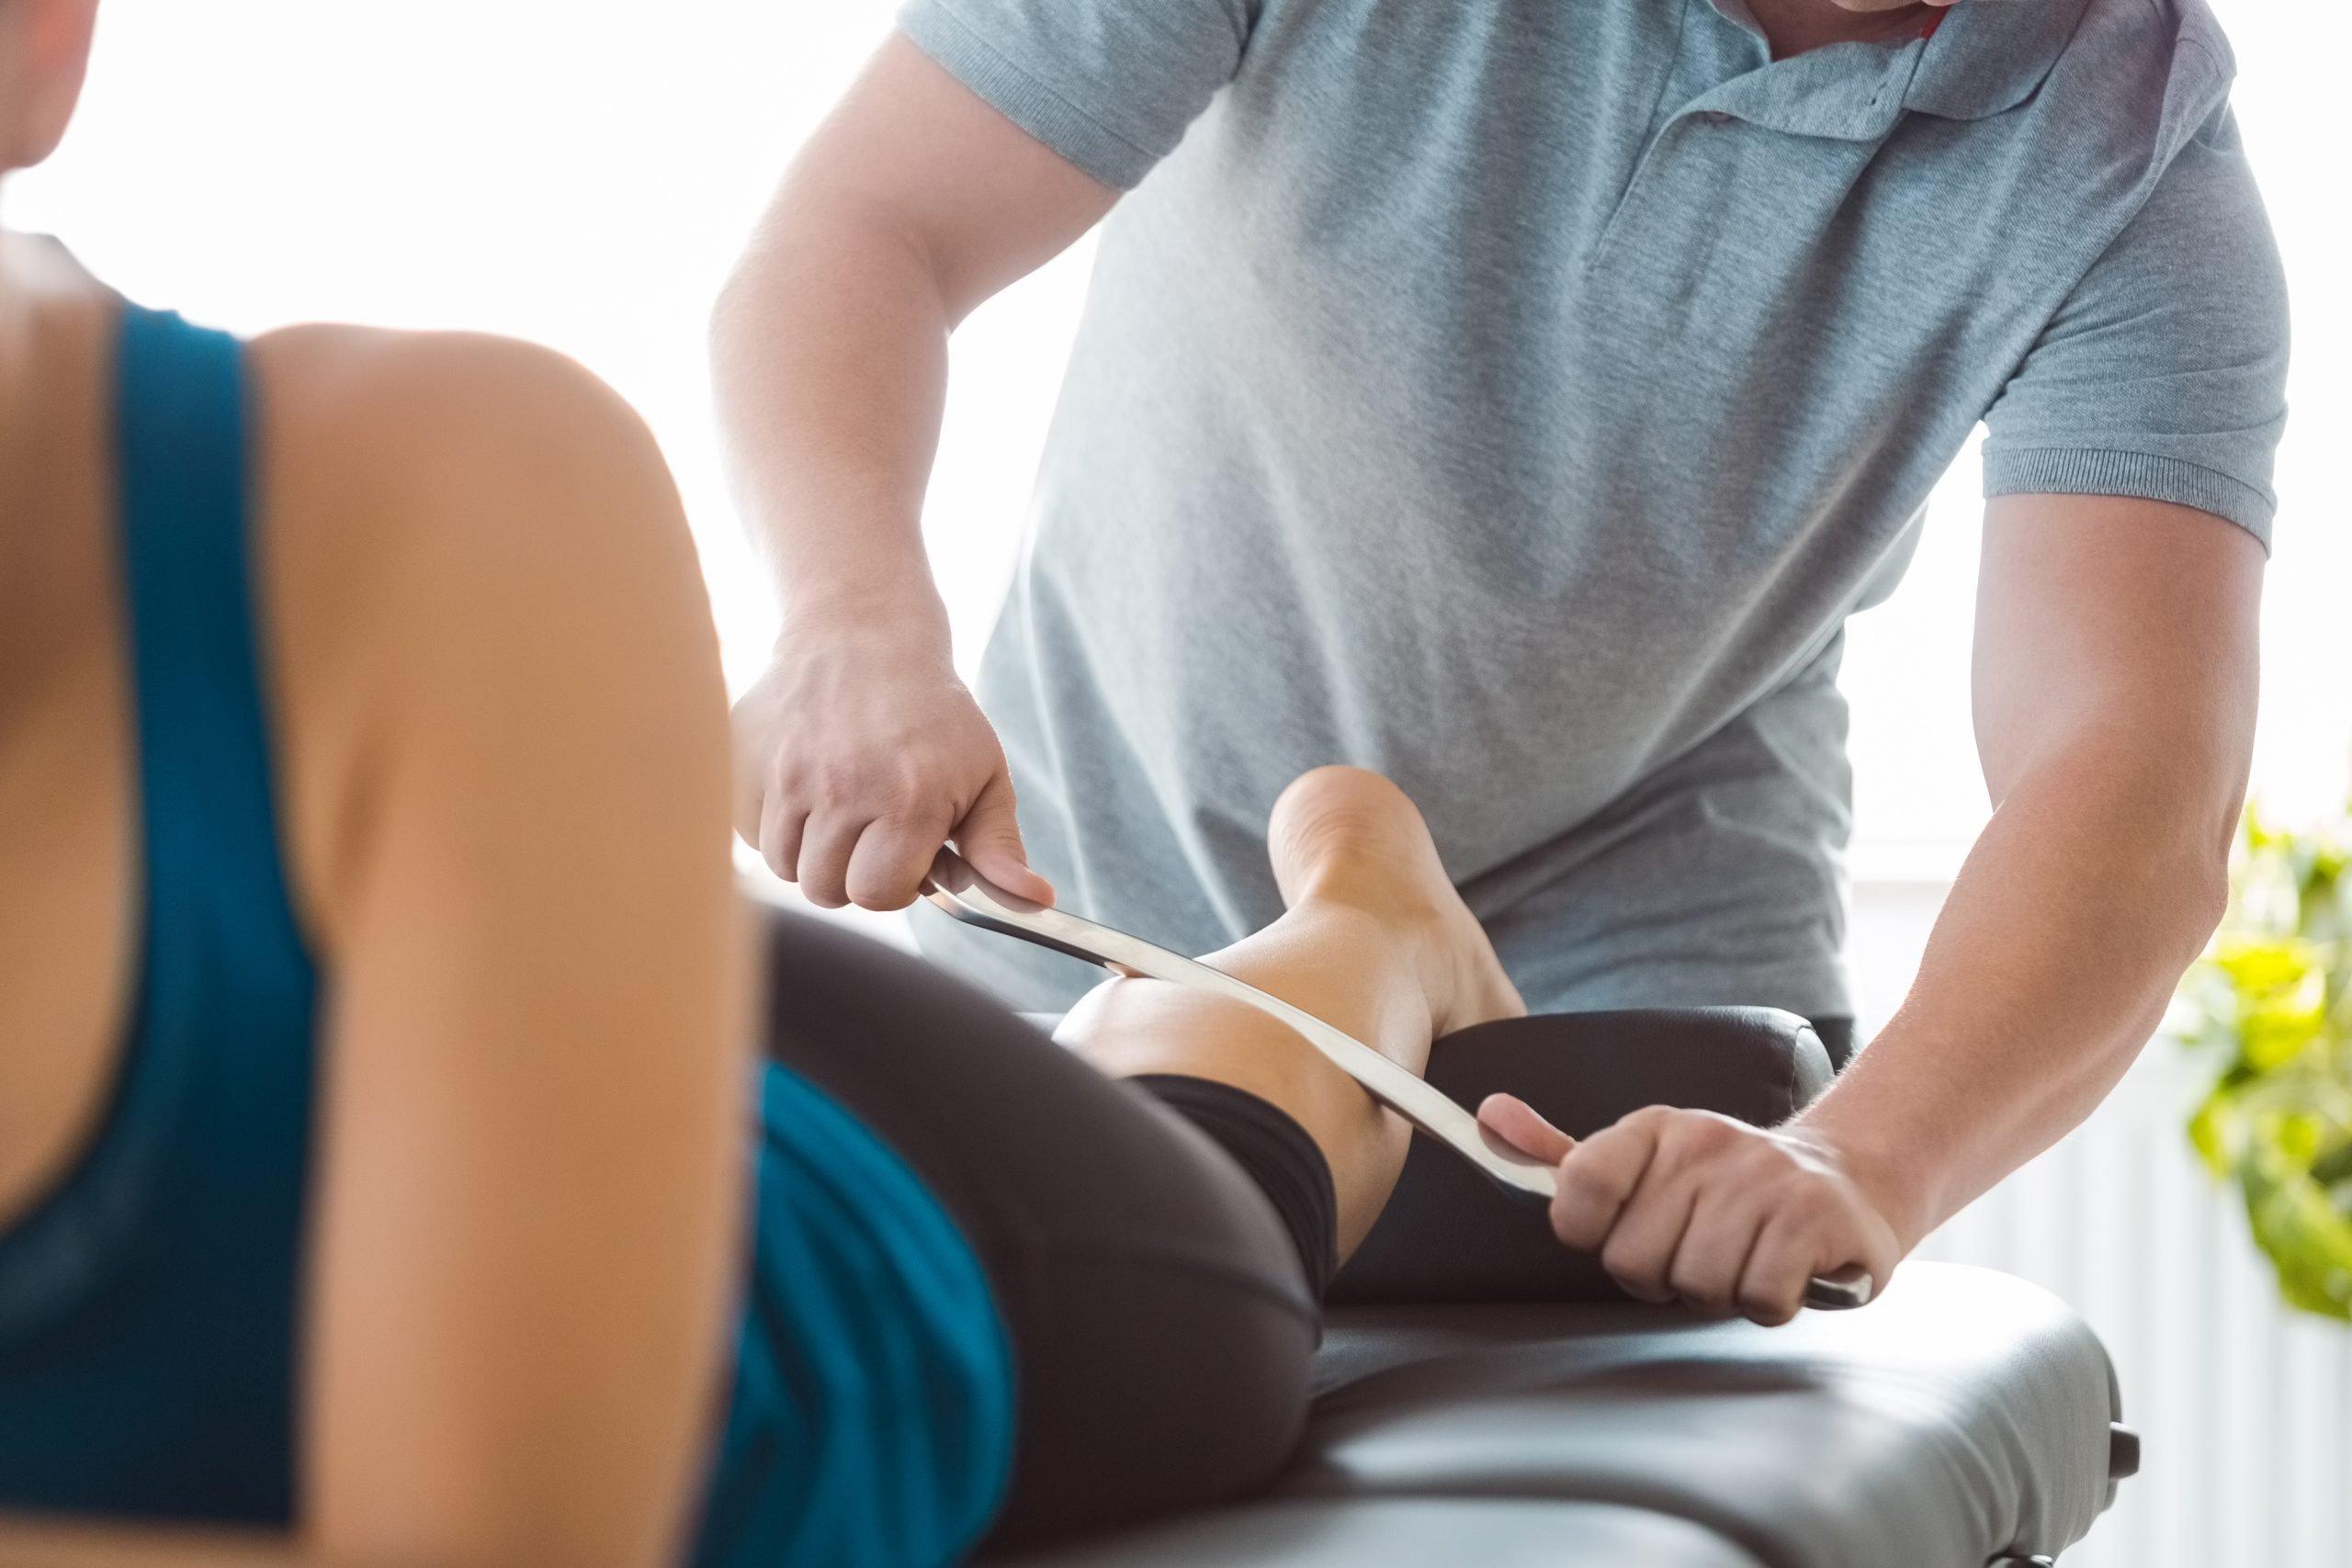 Physiotherapist massaging woman